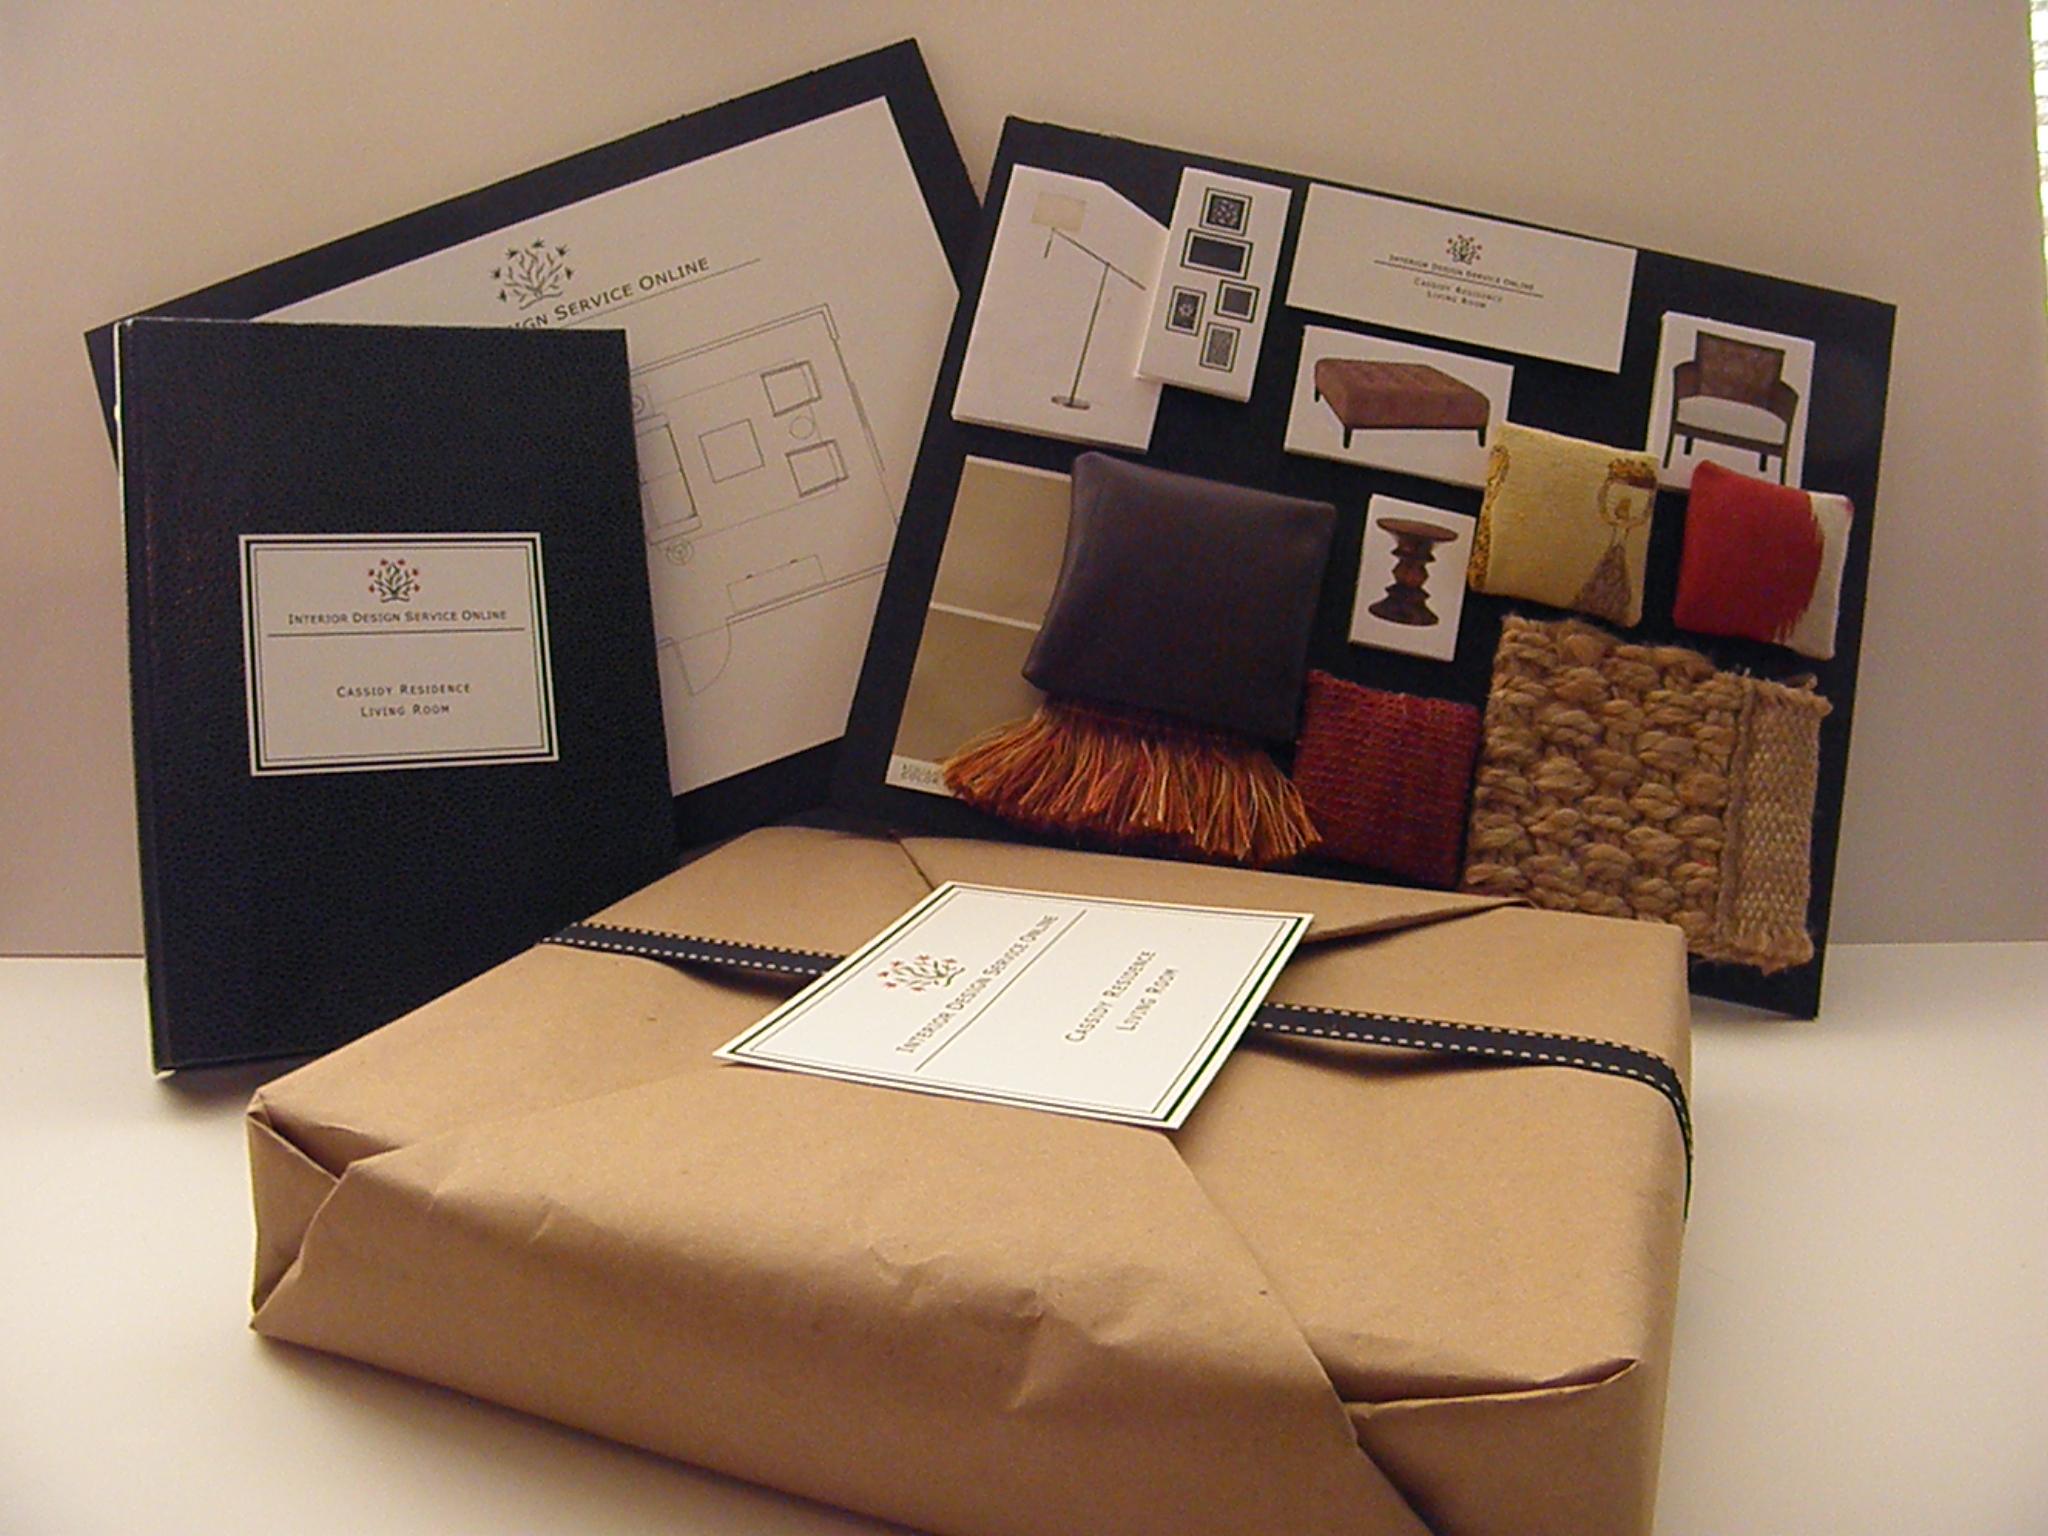 About archives interior design service online for Interior design service online